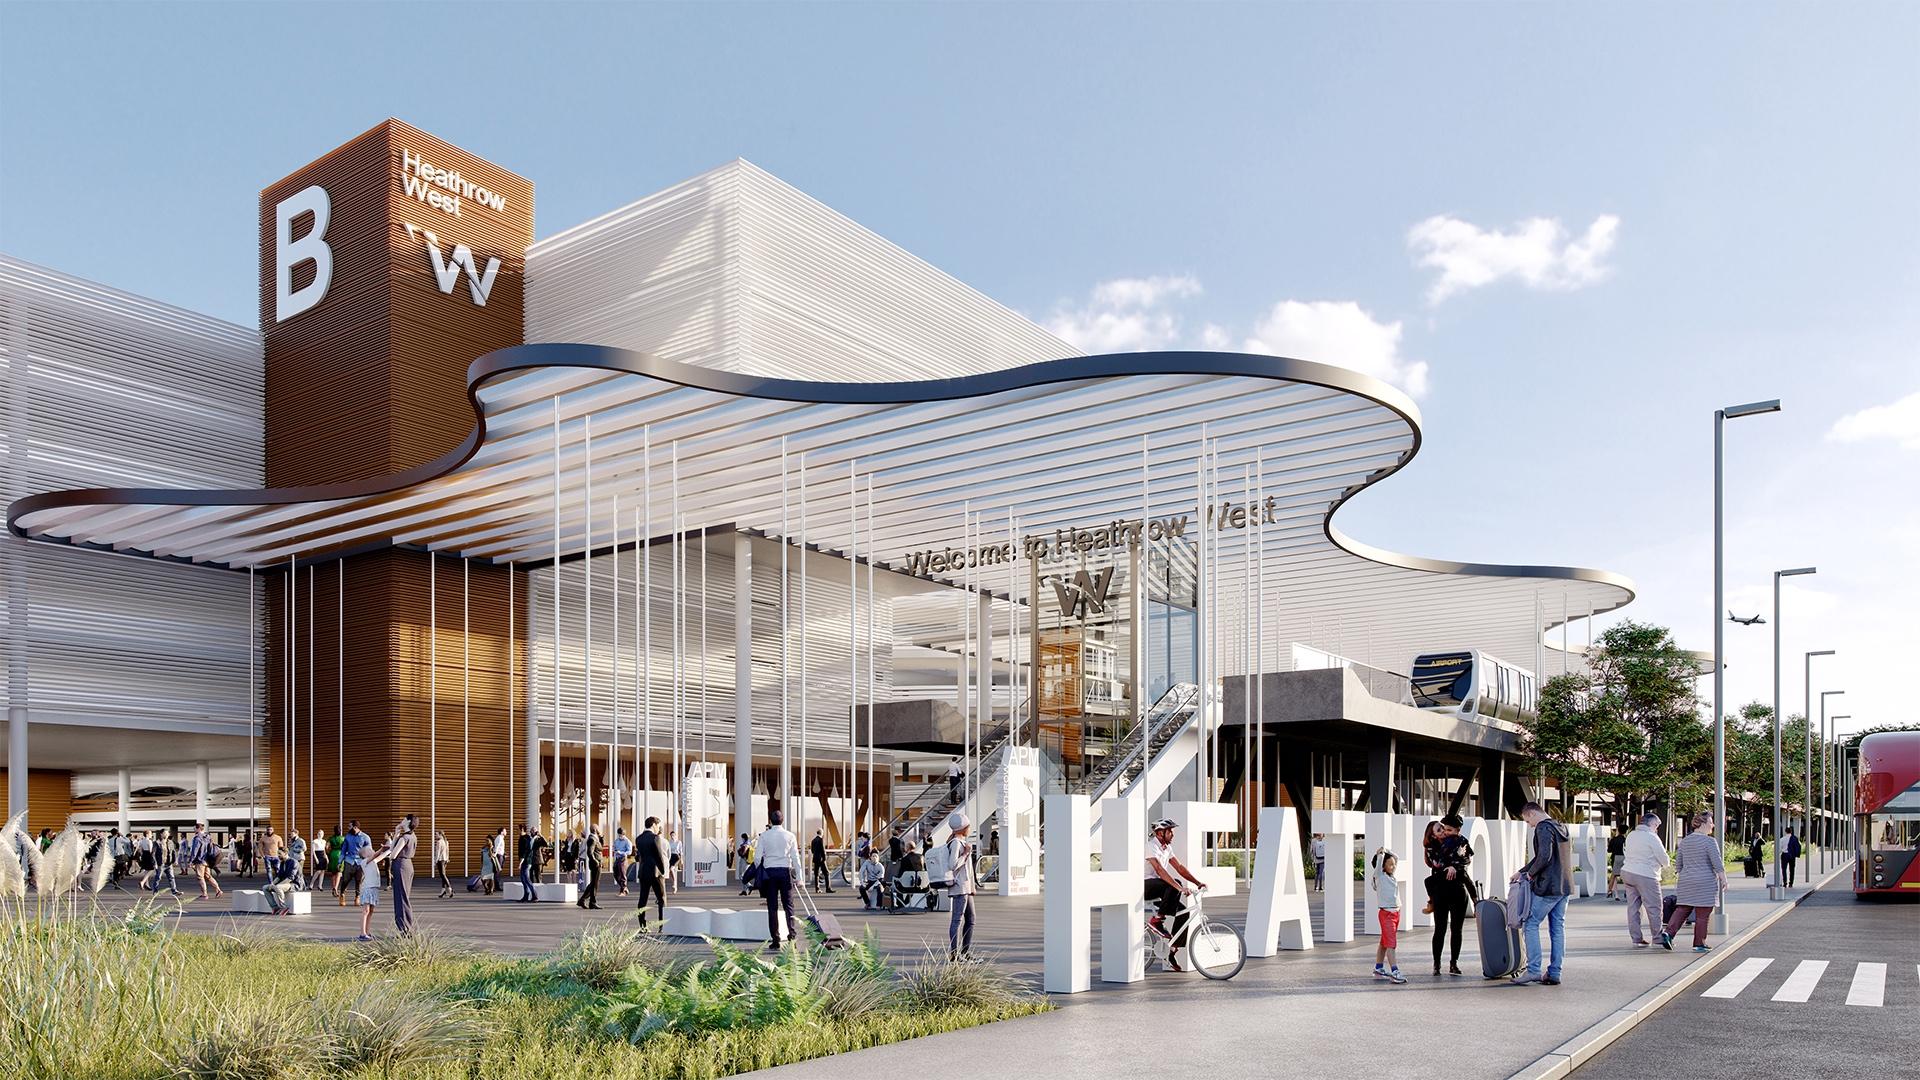 Heathrow West Features 1